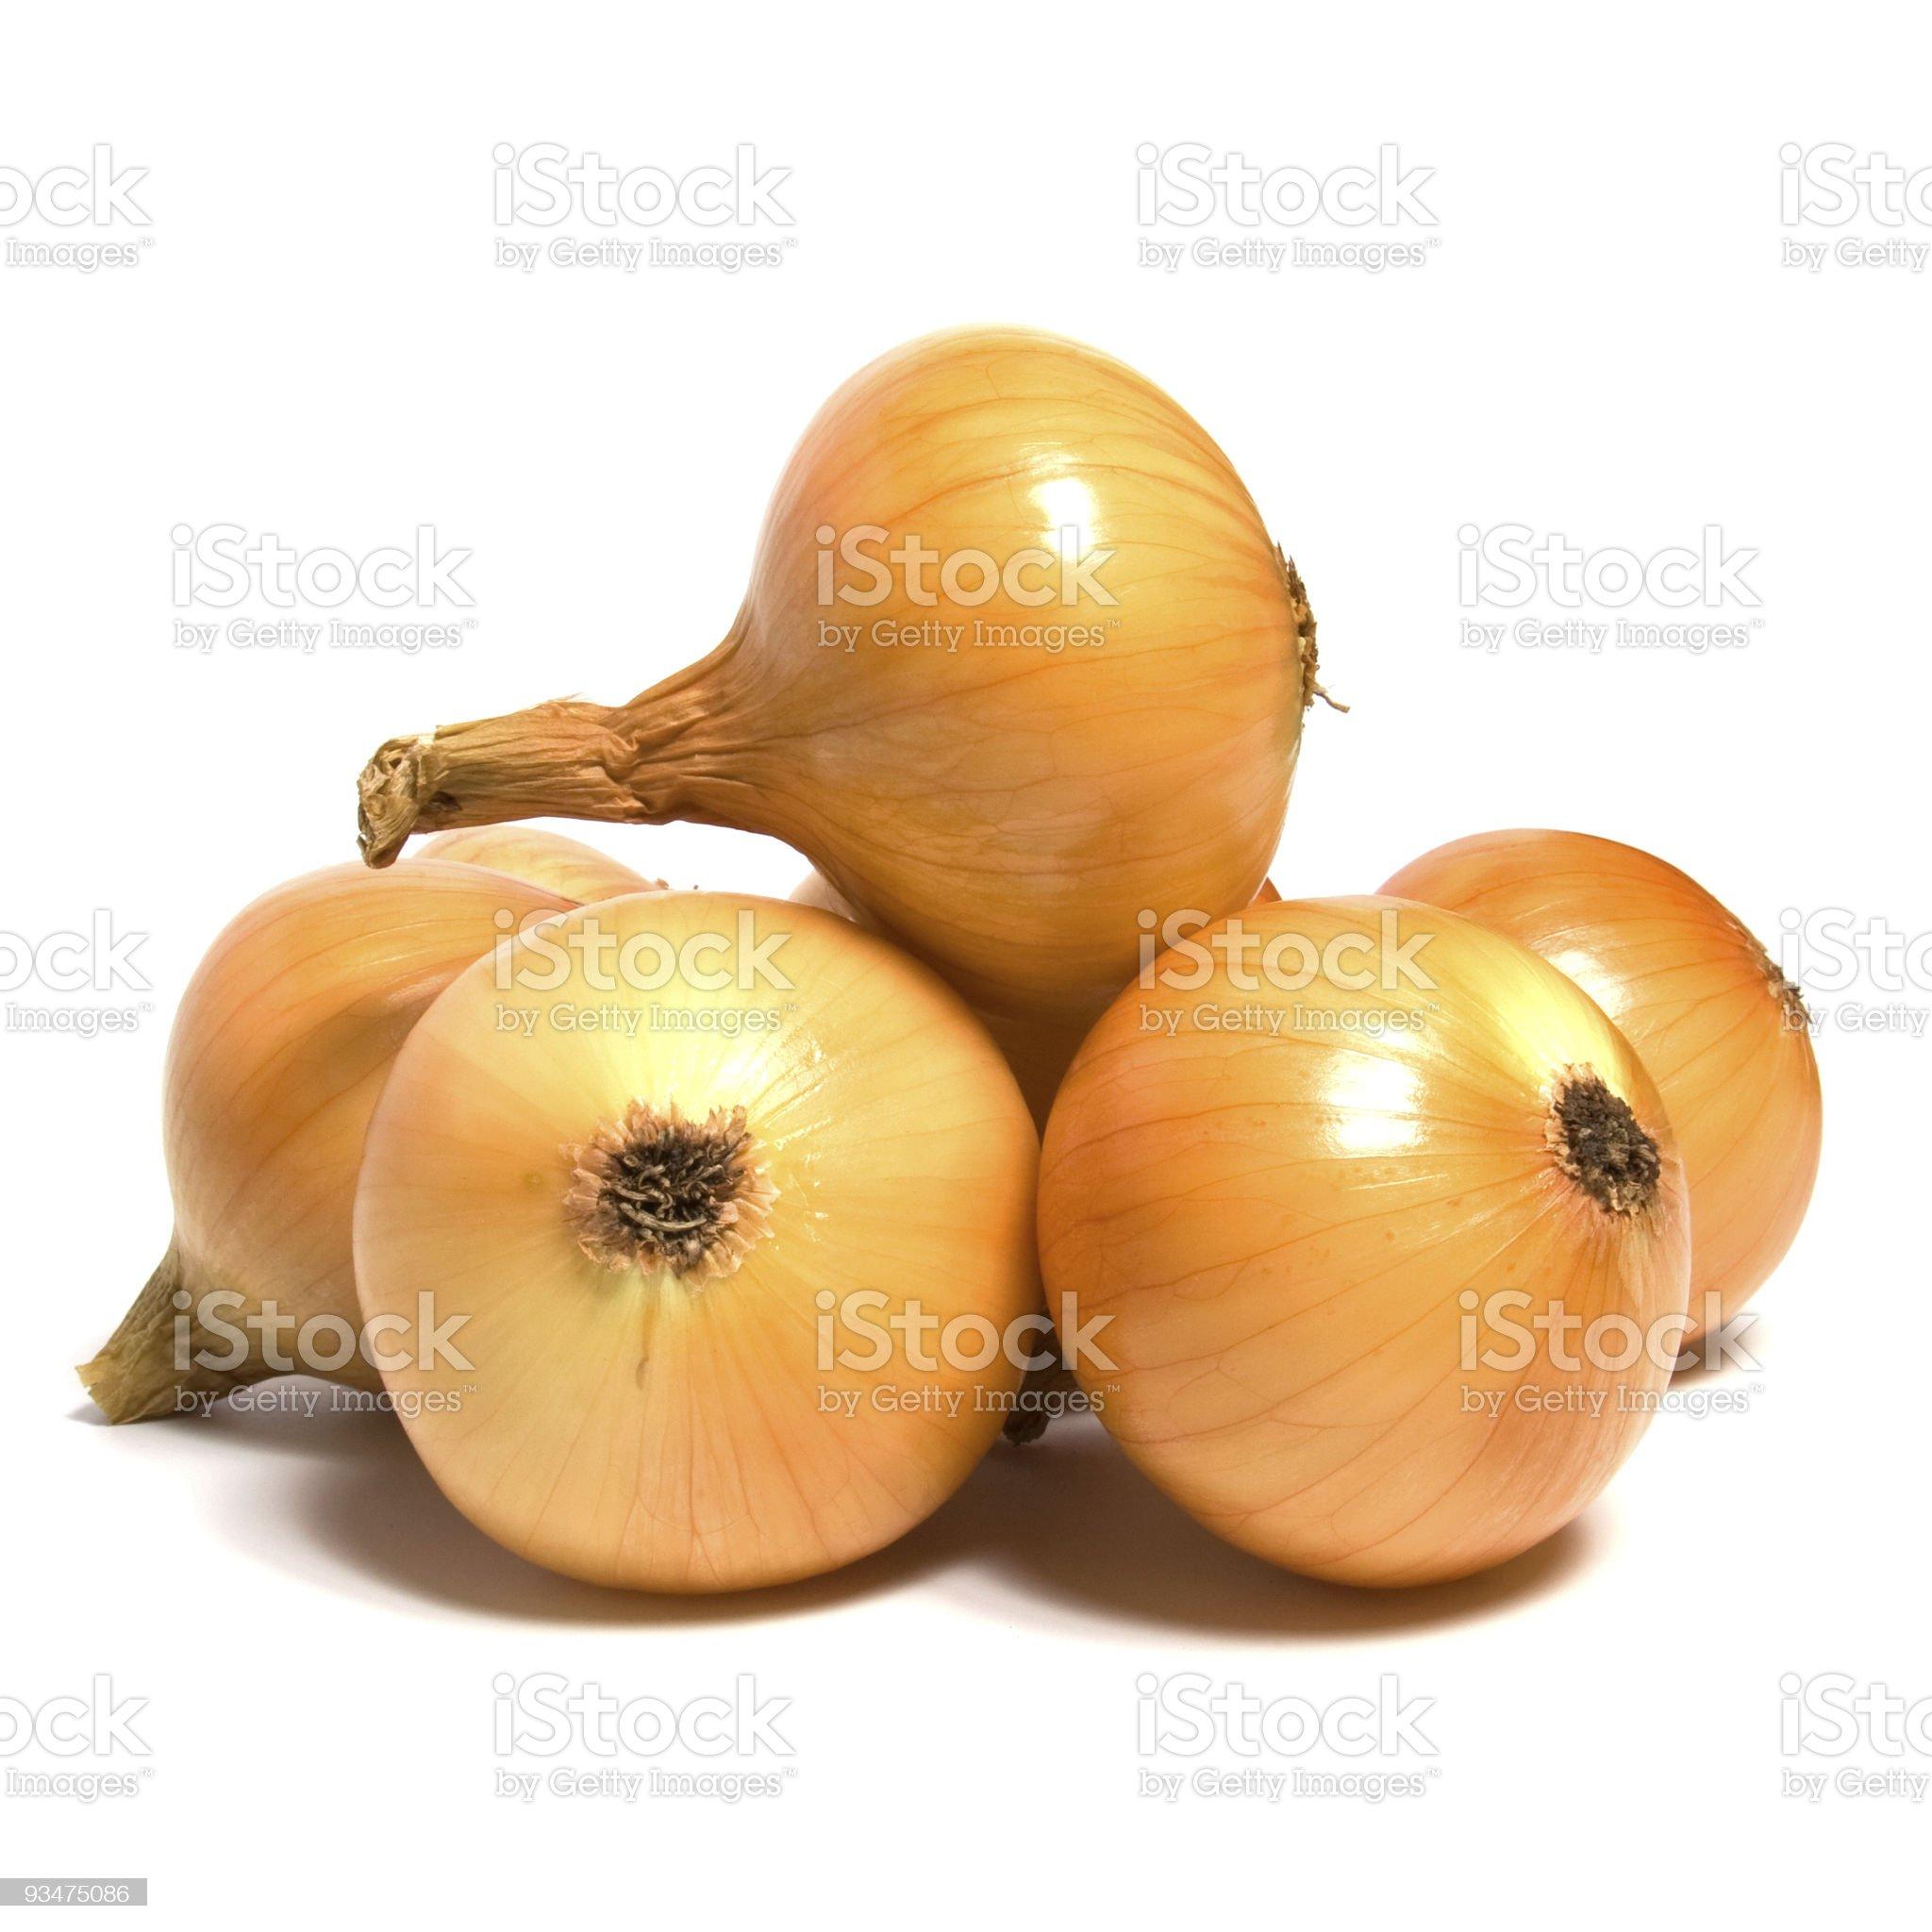 onion  on white background royalty-free stock photo